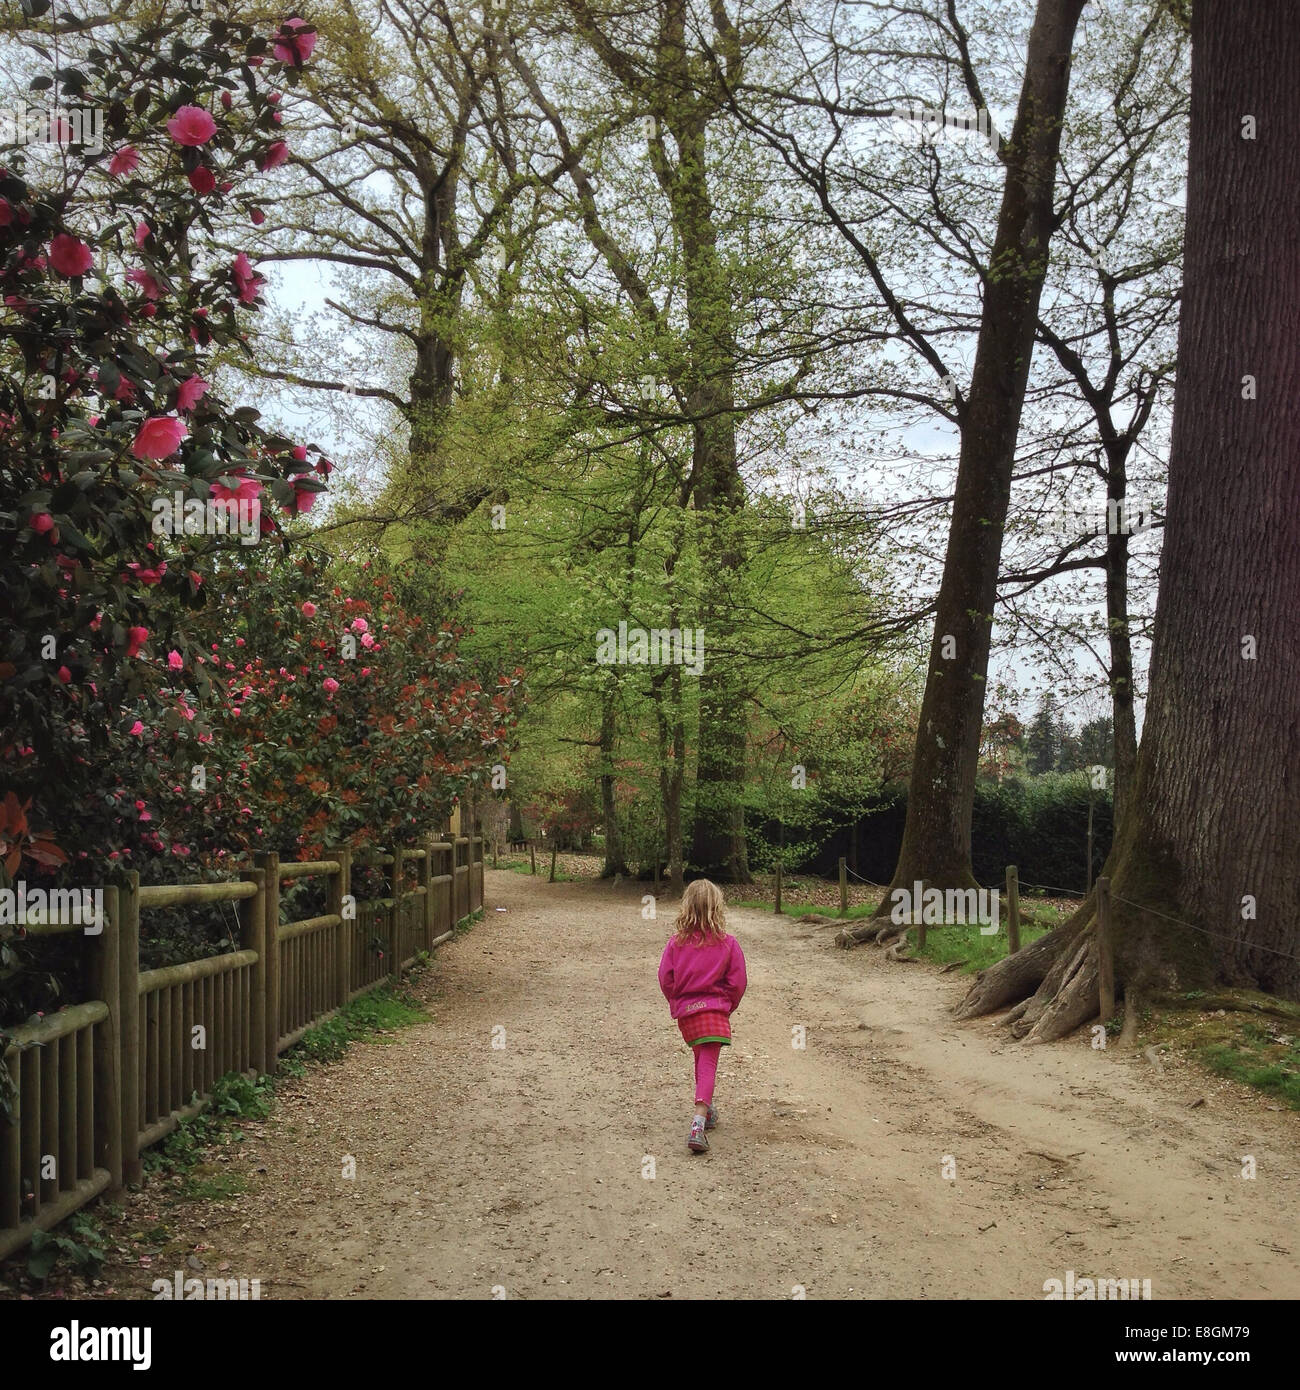 Frankreich, Ile-de-France, Yvelines, Rambouillet, Thoiry, Mädchen (12-13) im park Stockbild